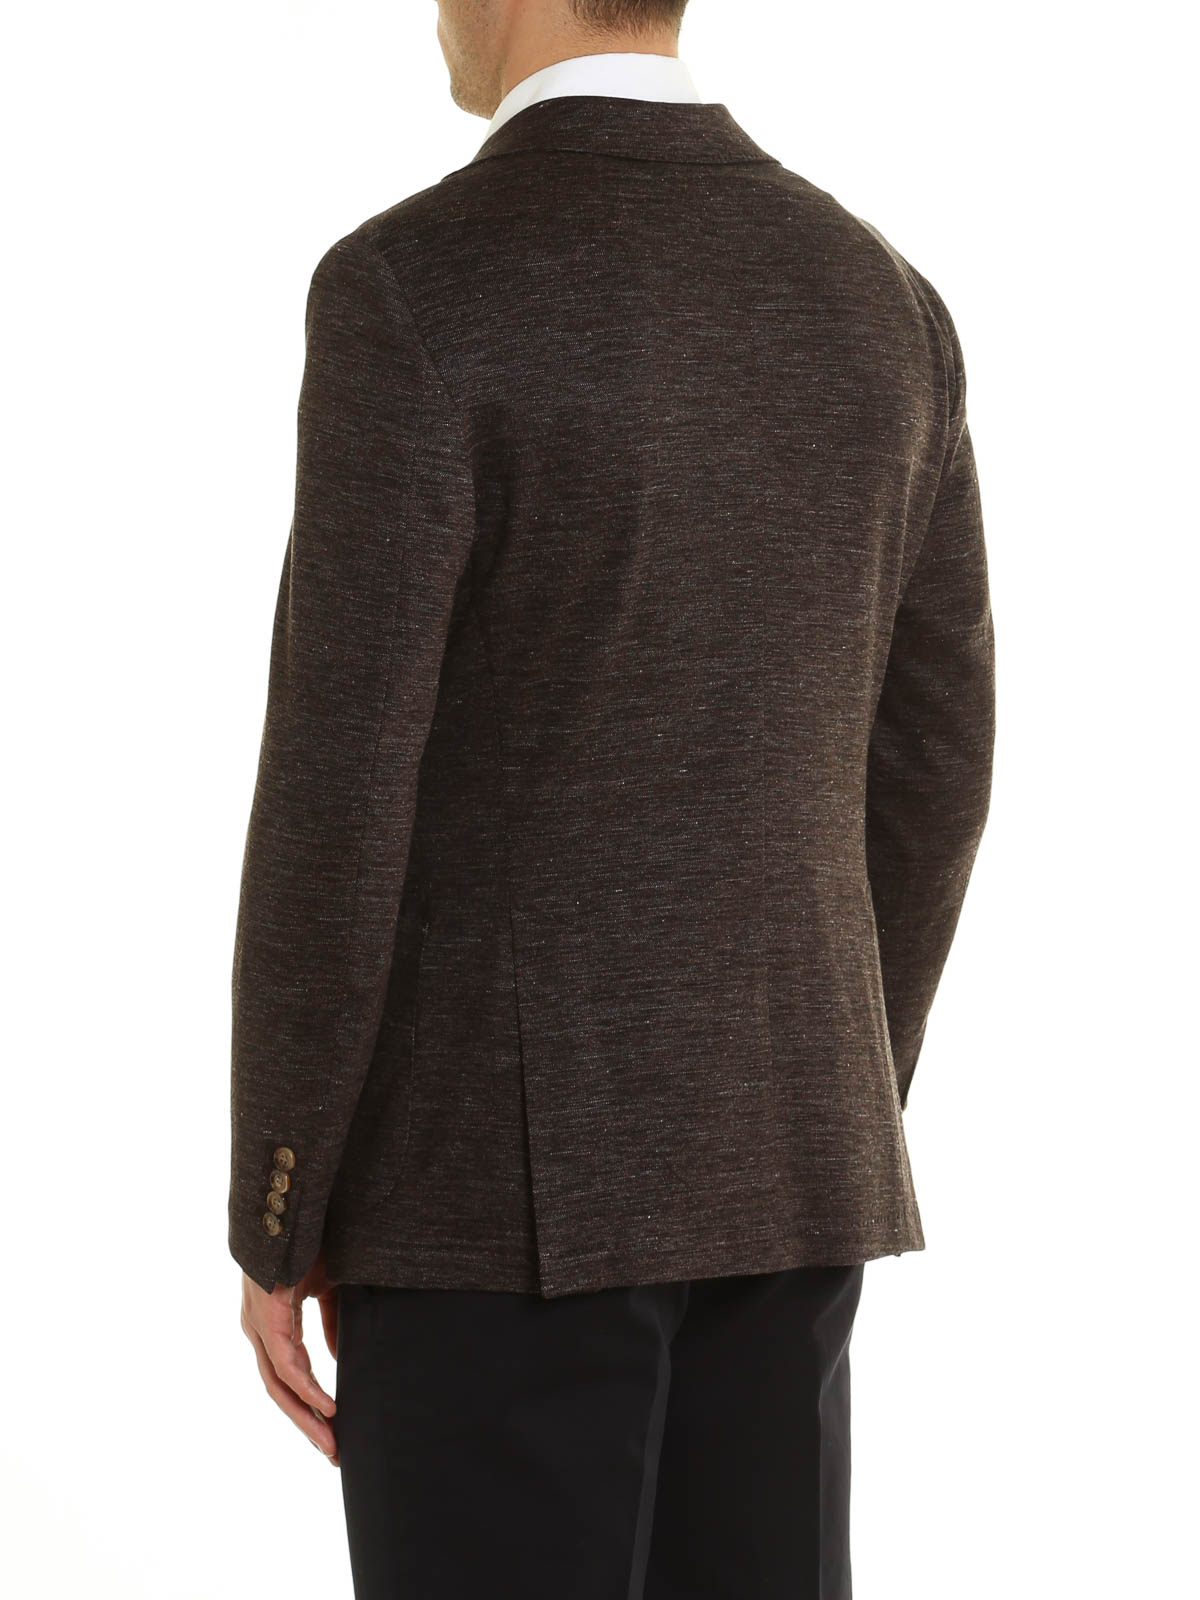 iKRIX ELEVENTY  giacche blazer - Giacca in lino misto cotone melange 81c1462a12c